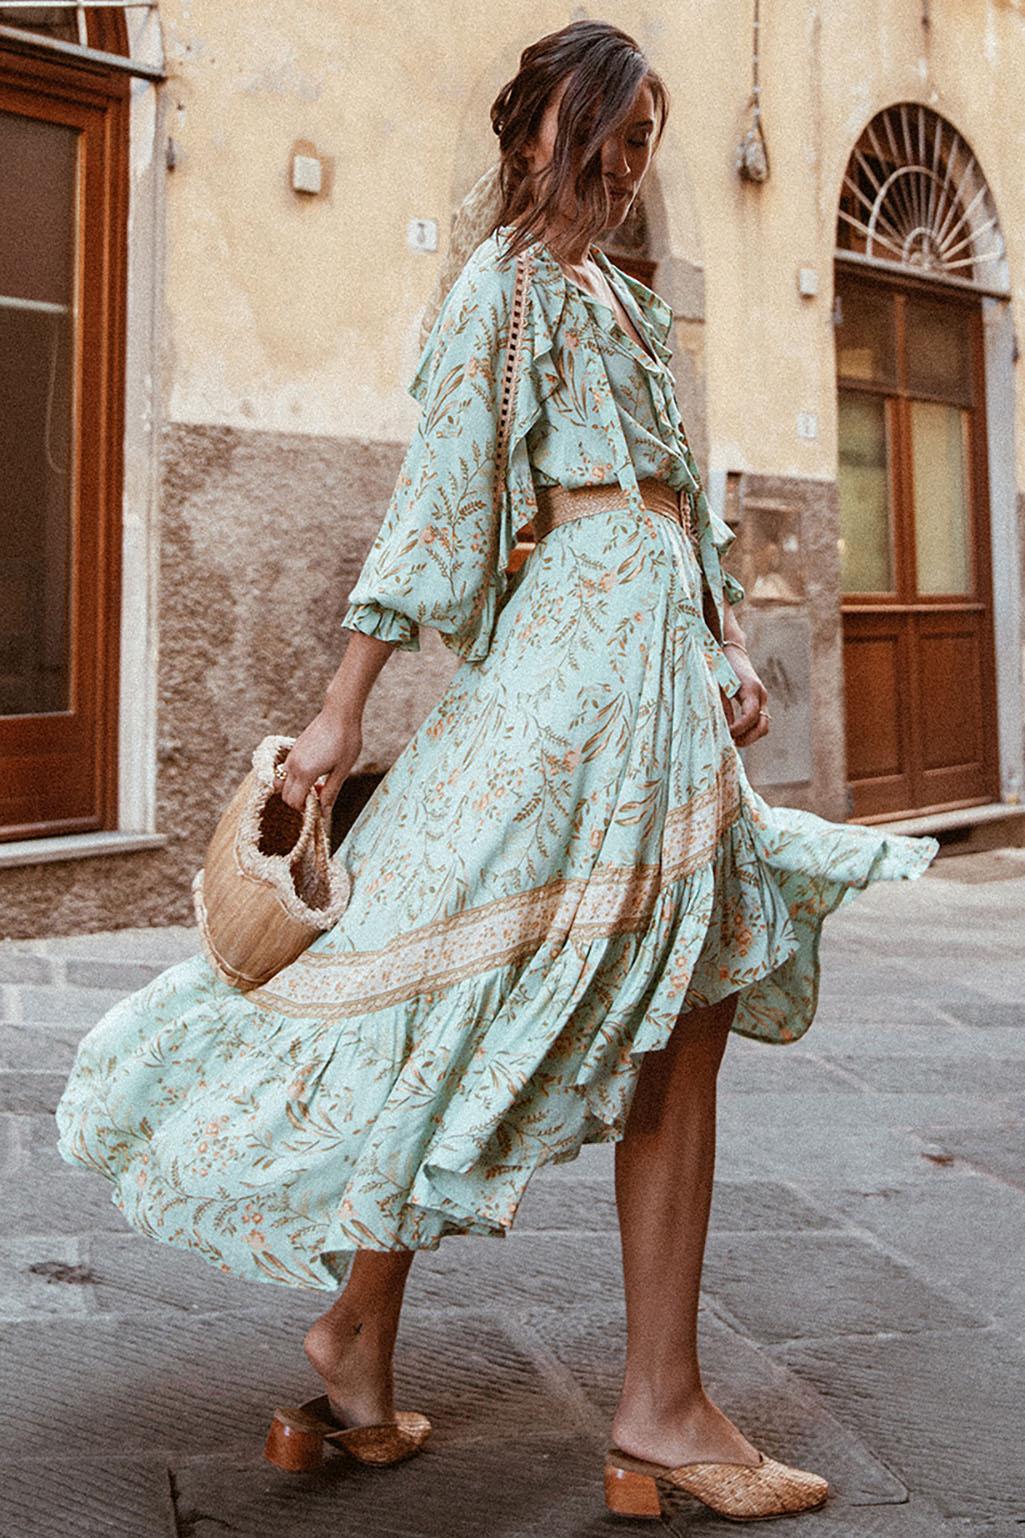 Spell-MaisieMaxiSkirt-VintageTurquoise-6507.jpg